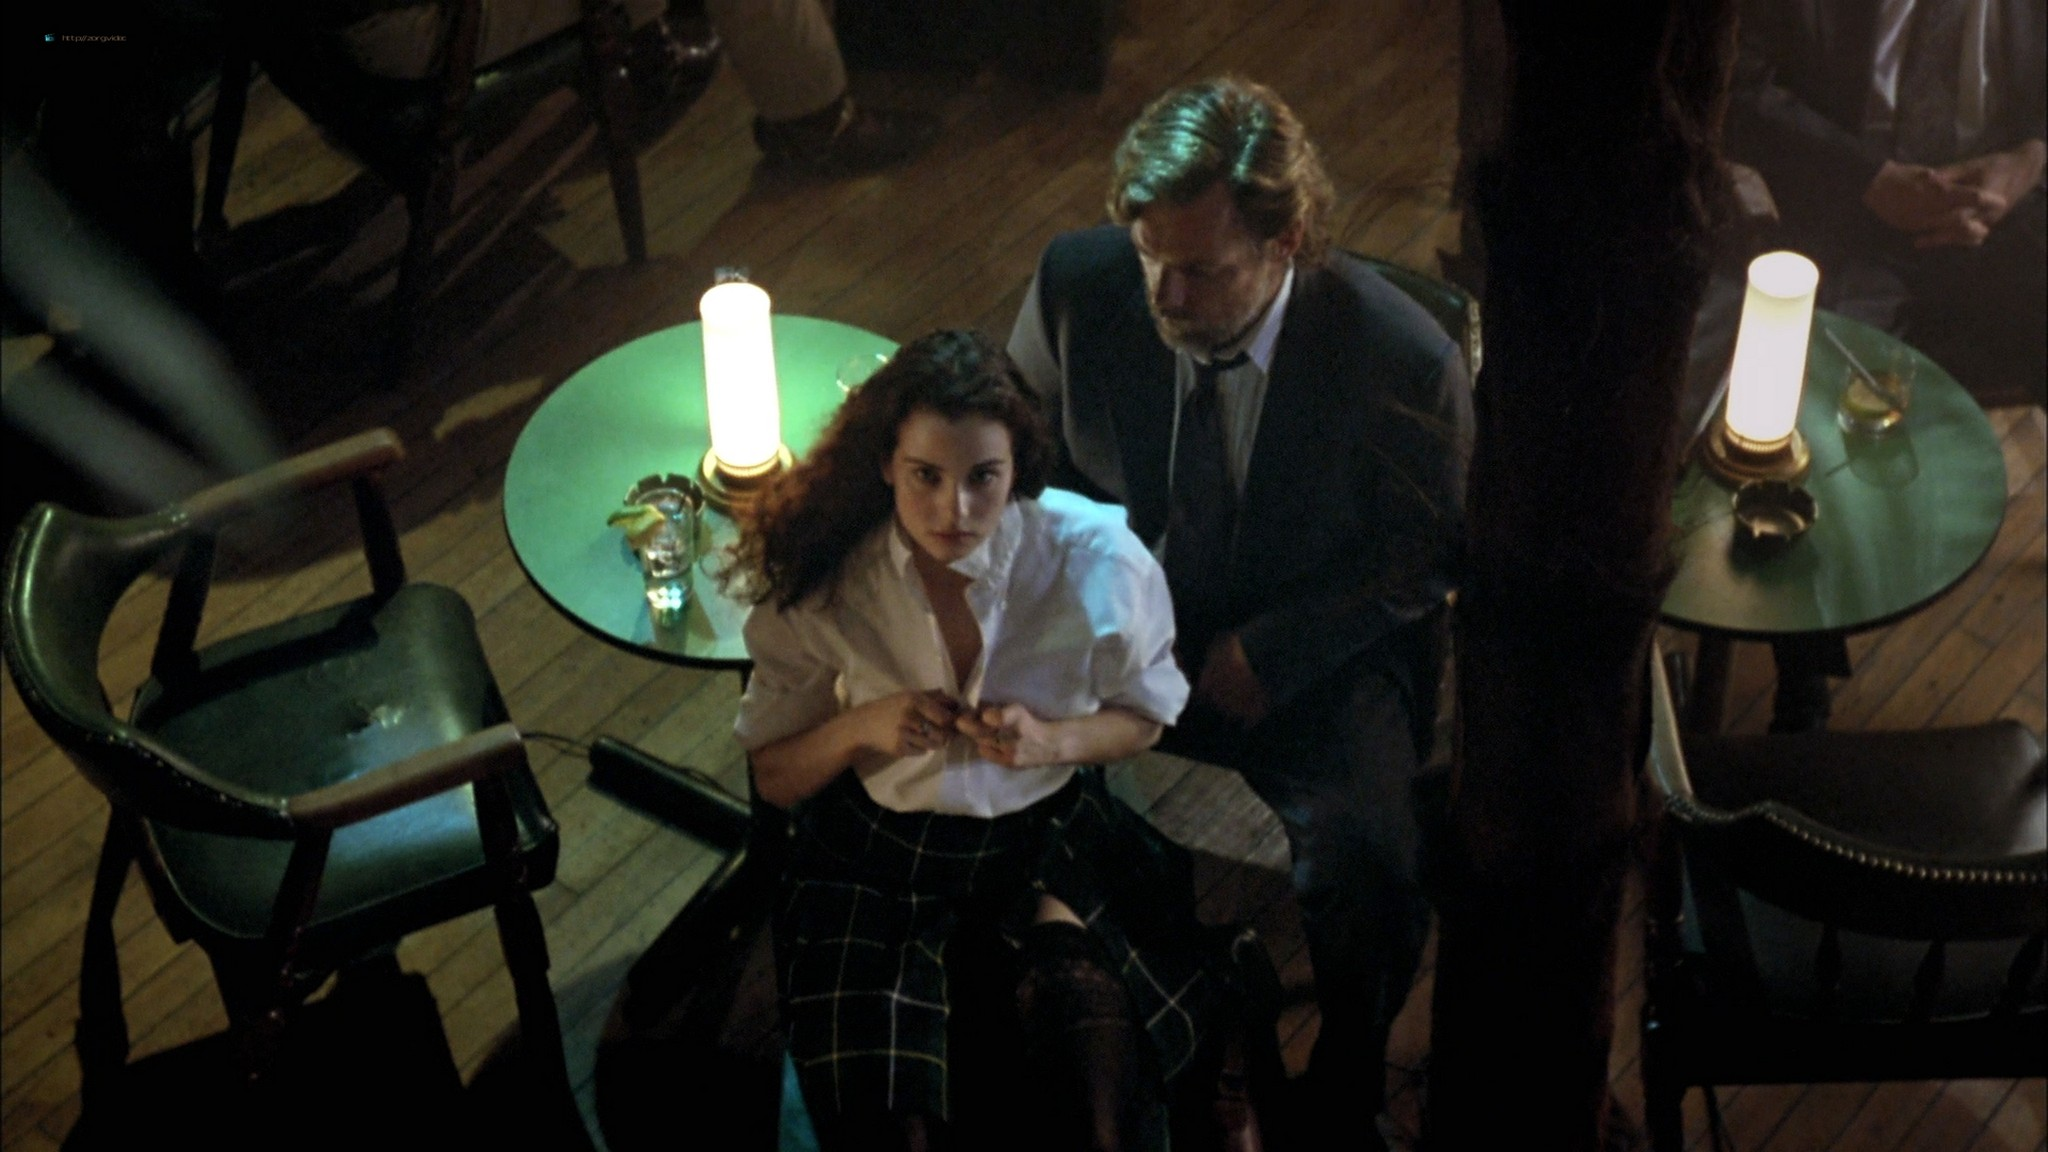 Mia Kirshner nude Arsinée Khanjian sexy - Exotica (1994) HD 1080p BluRay REMUX (17)